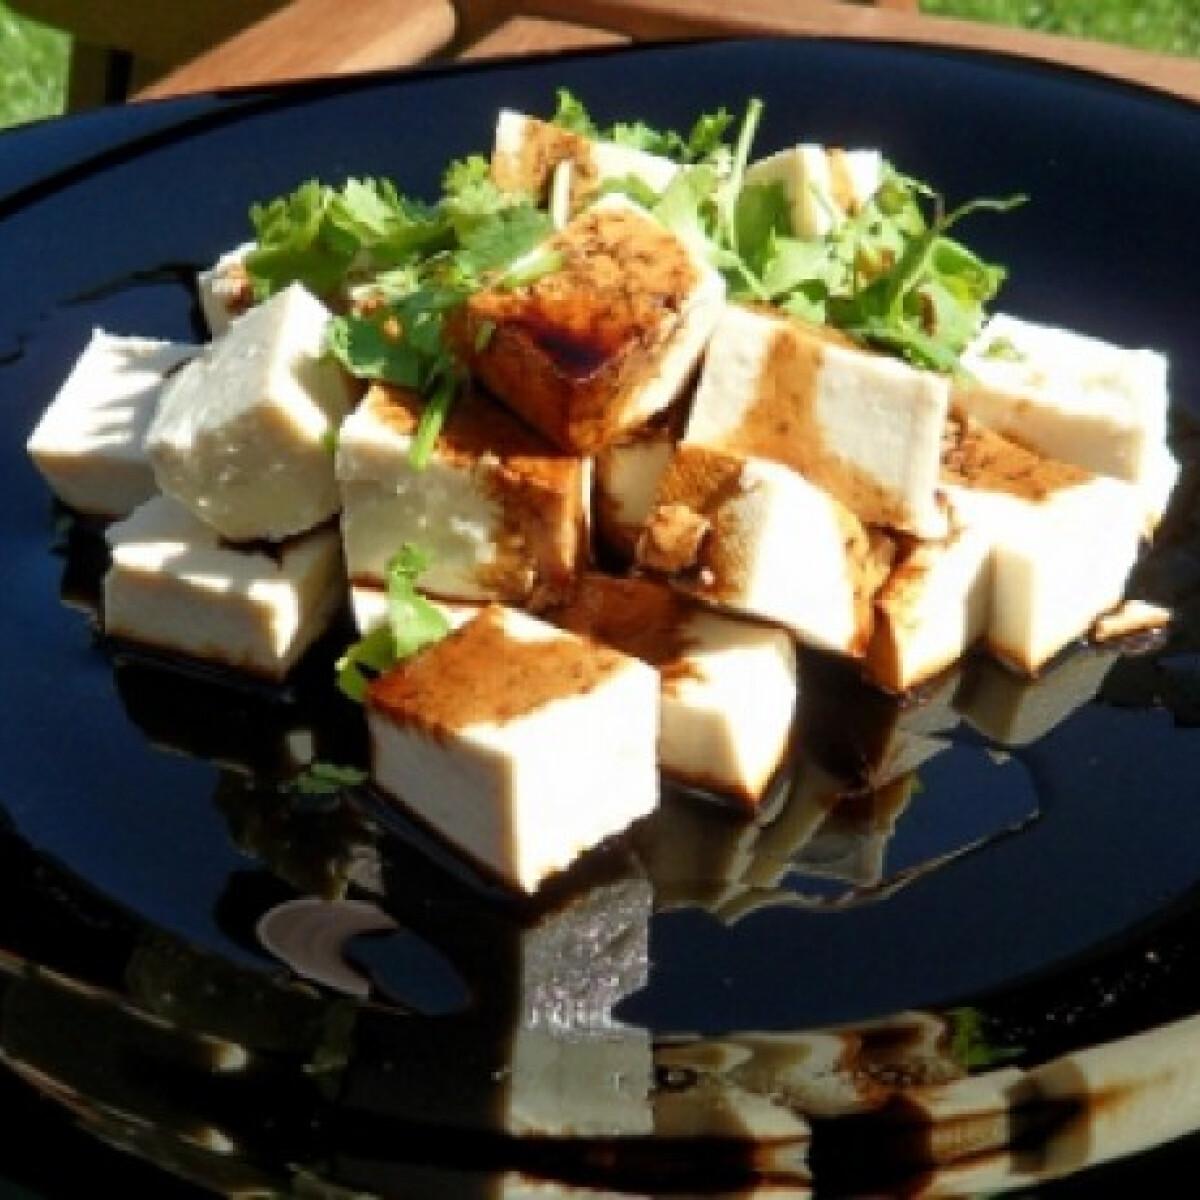 Korianderes tofu